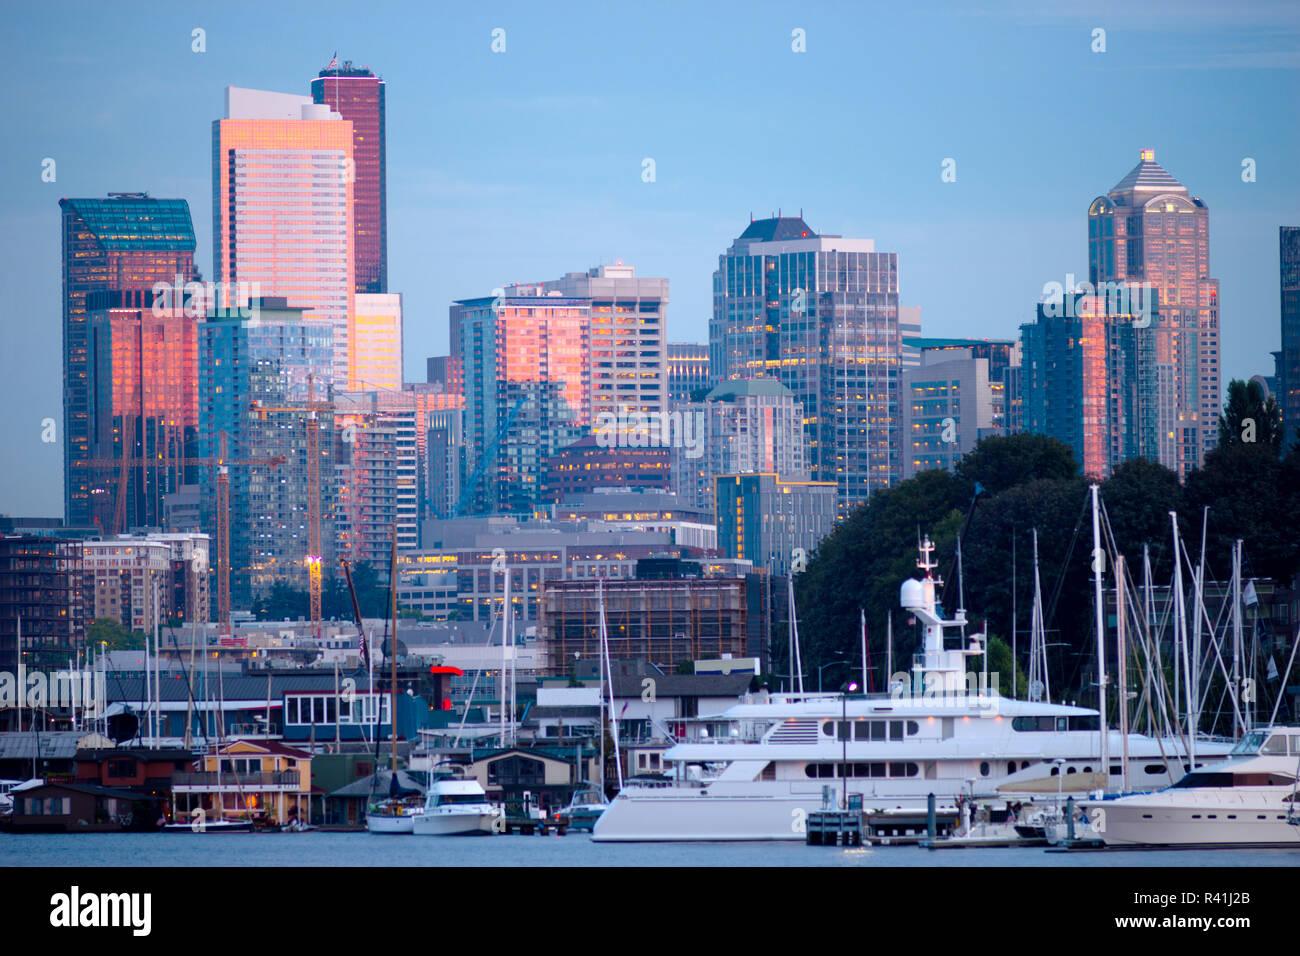 Luxury Yachts Boats Lake Union Seattle Downtown City Skyline - Stock Image